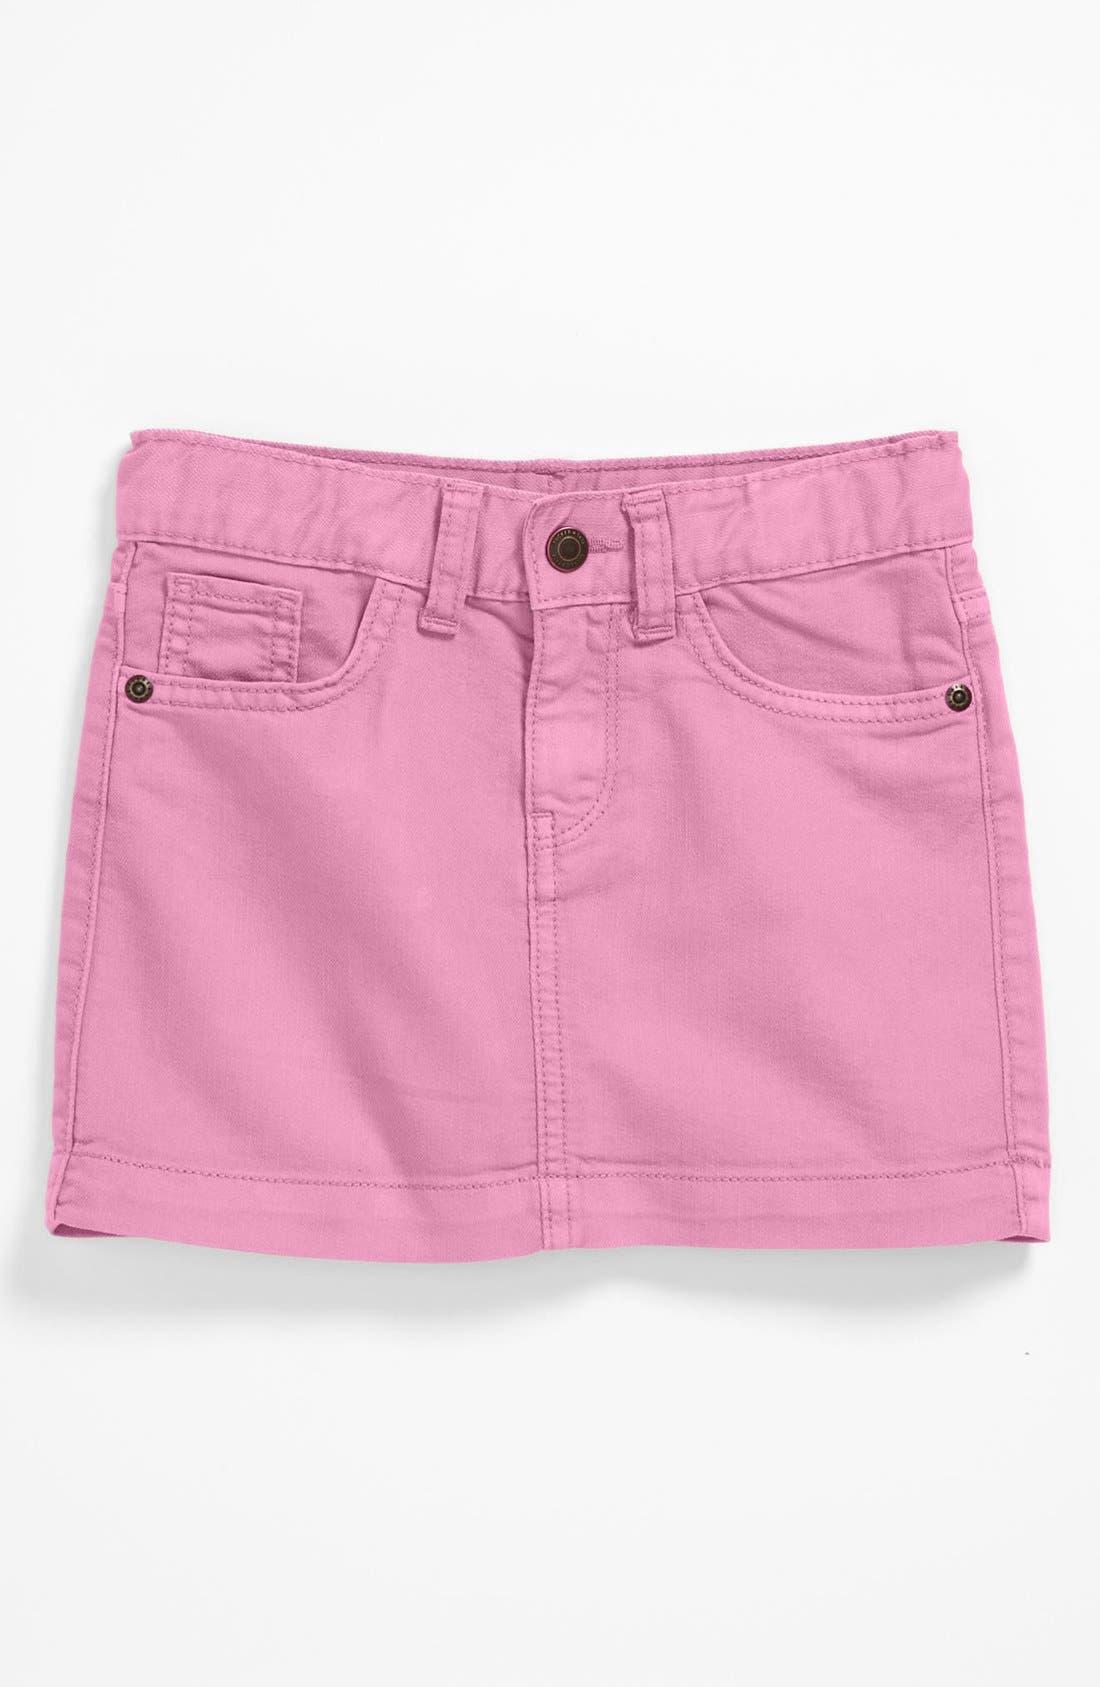 Alternate Image 1 Selected - Tucker + Tate Denim Skirt (Big Girls)